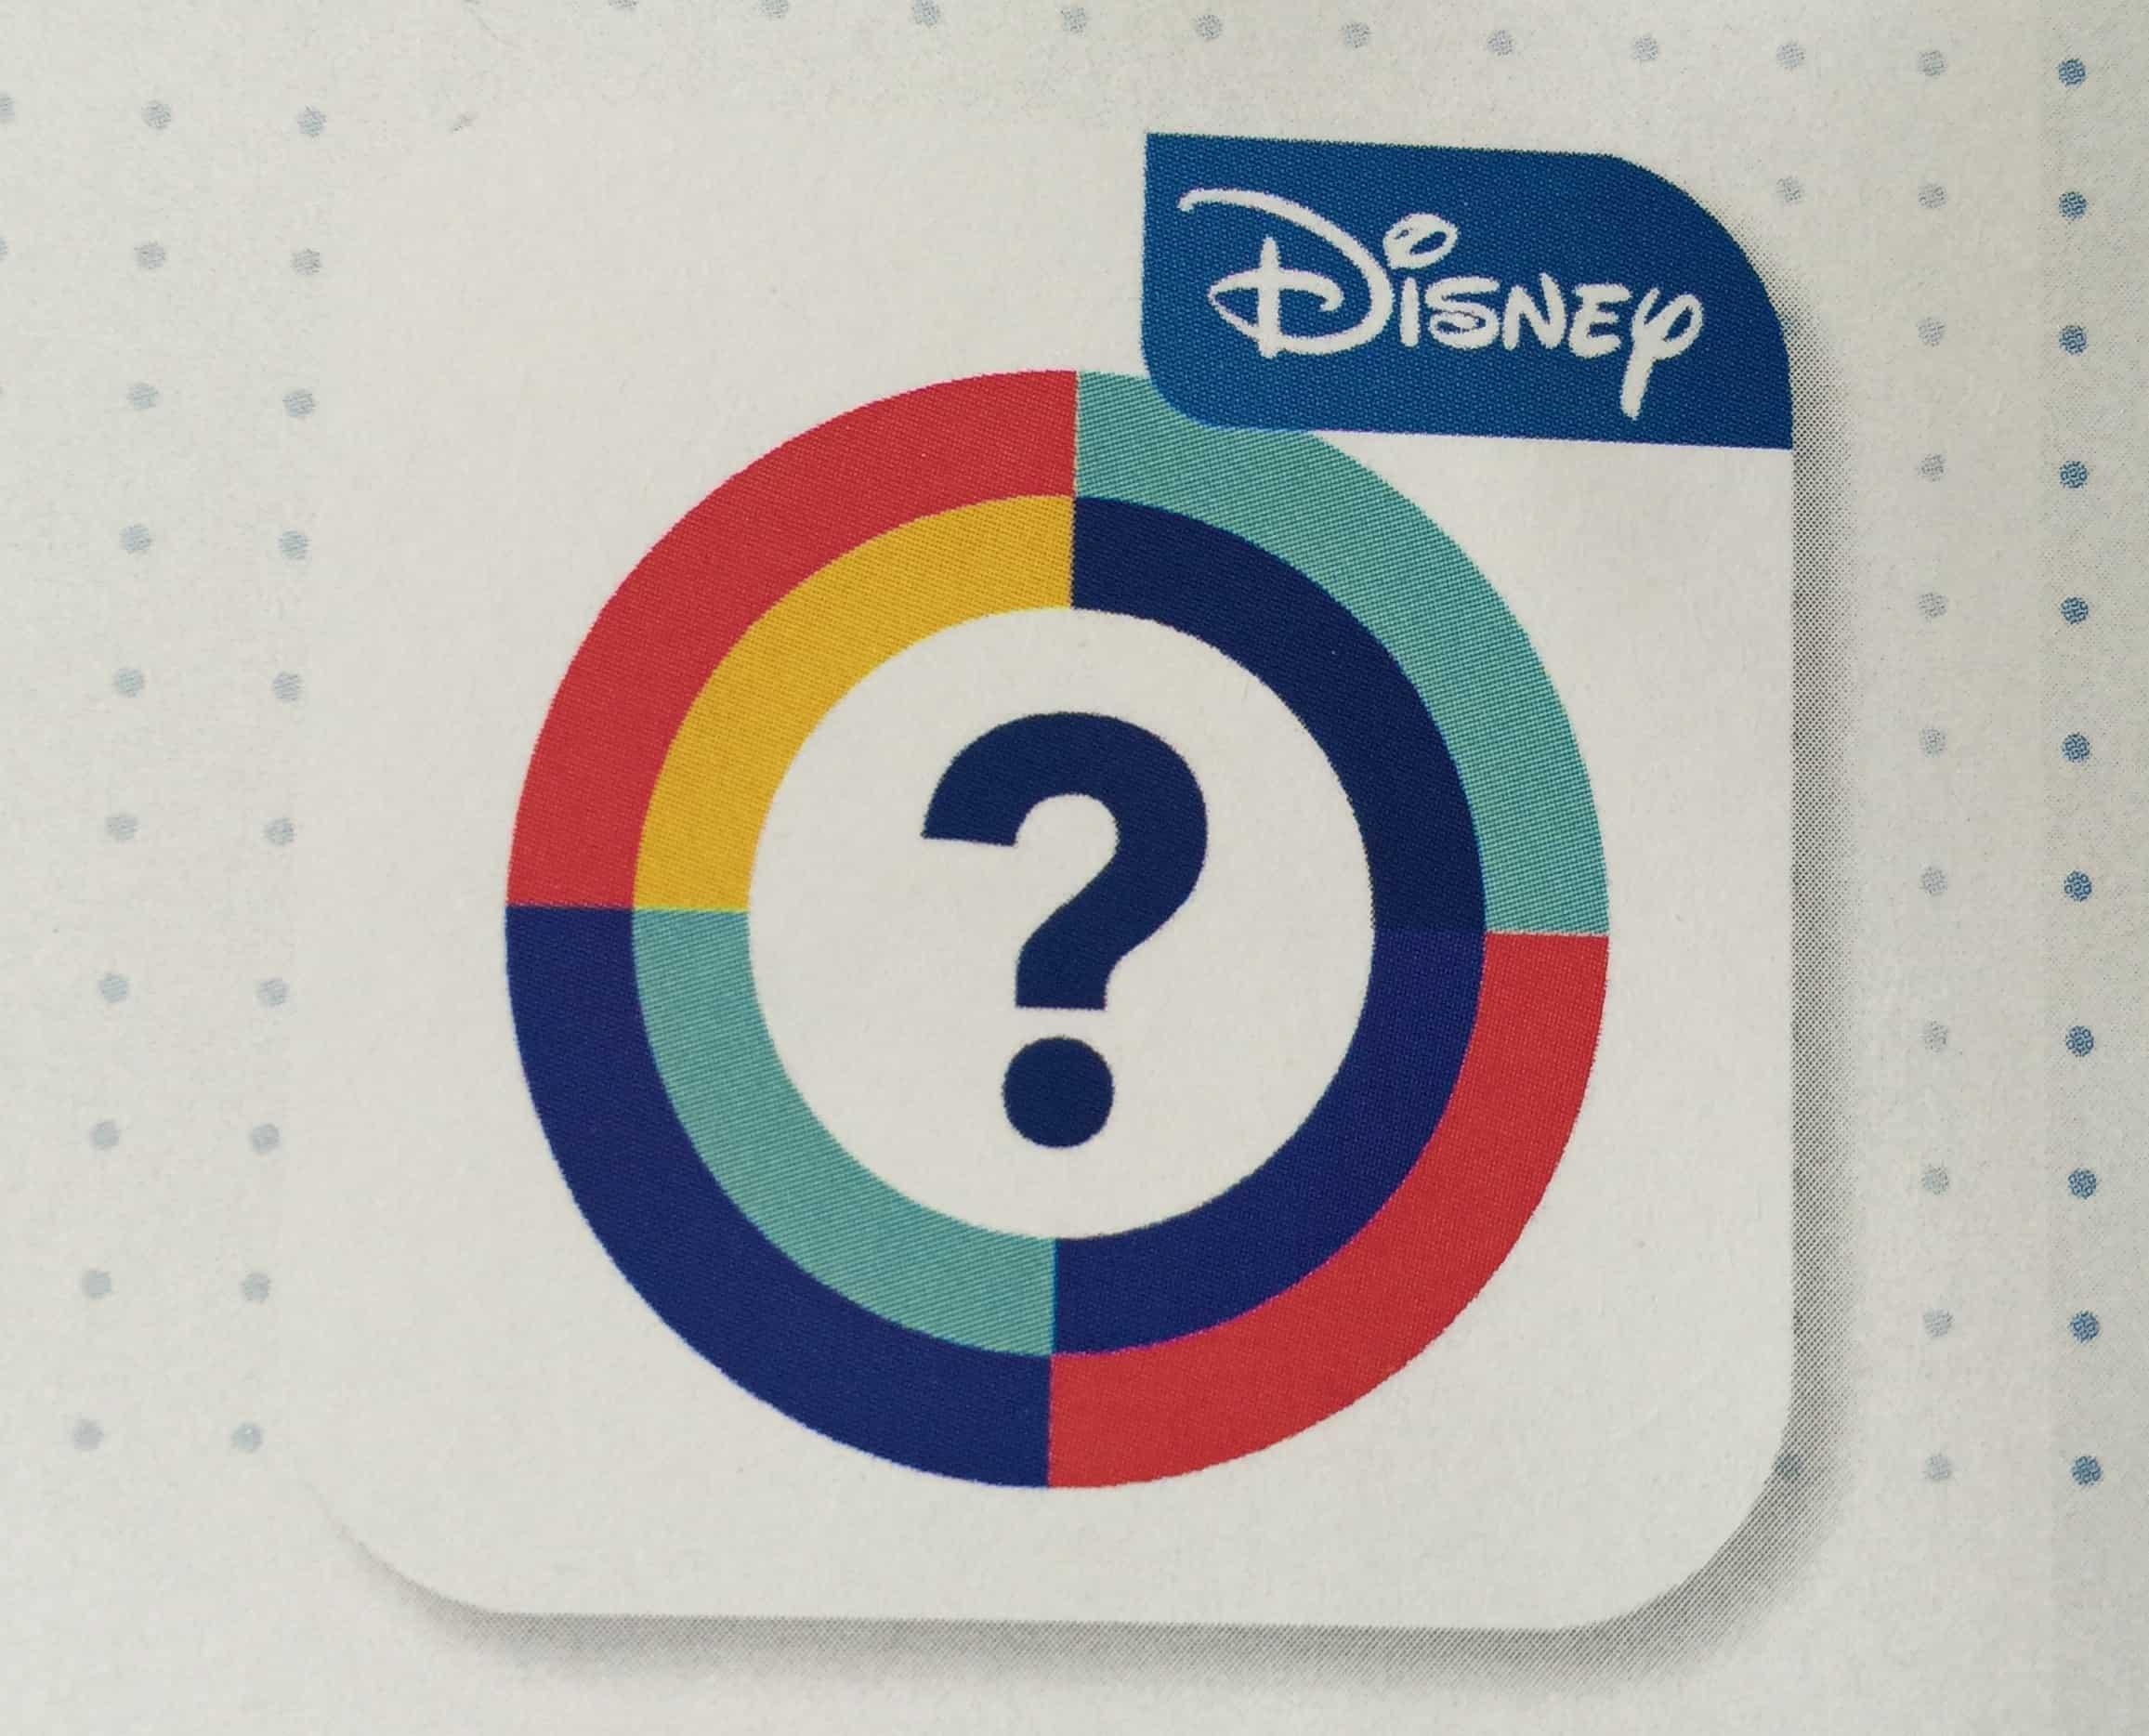 Disney_quiz_app